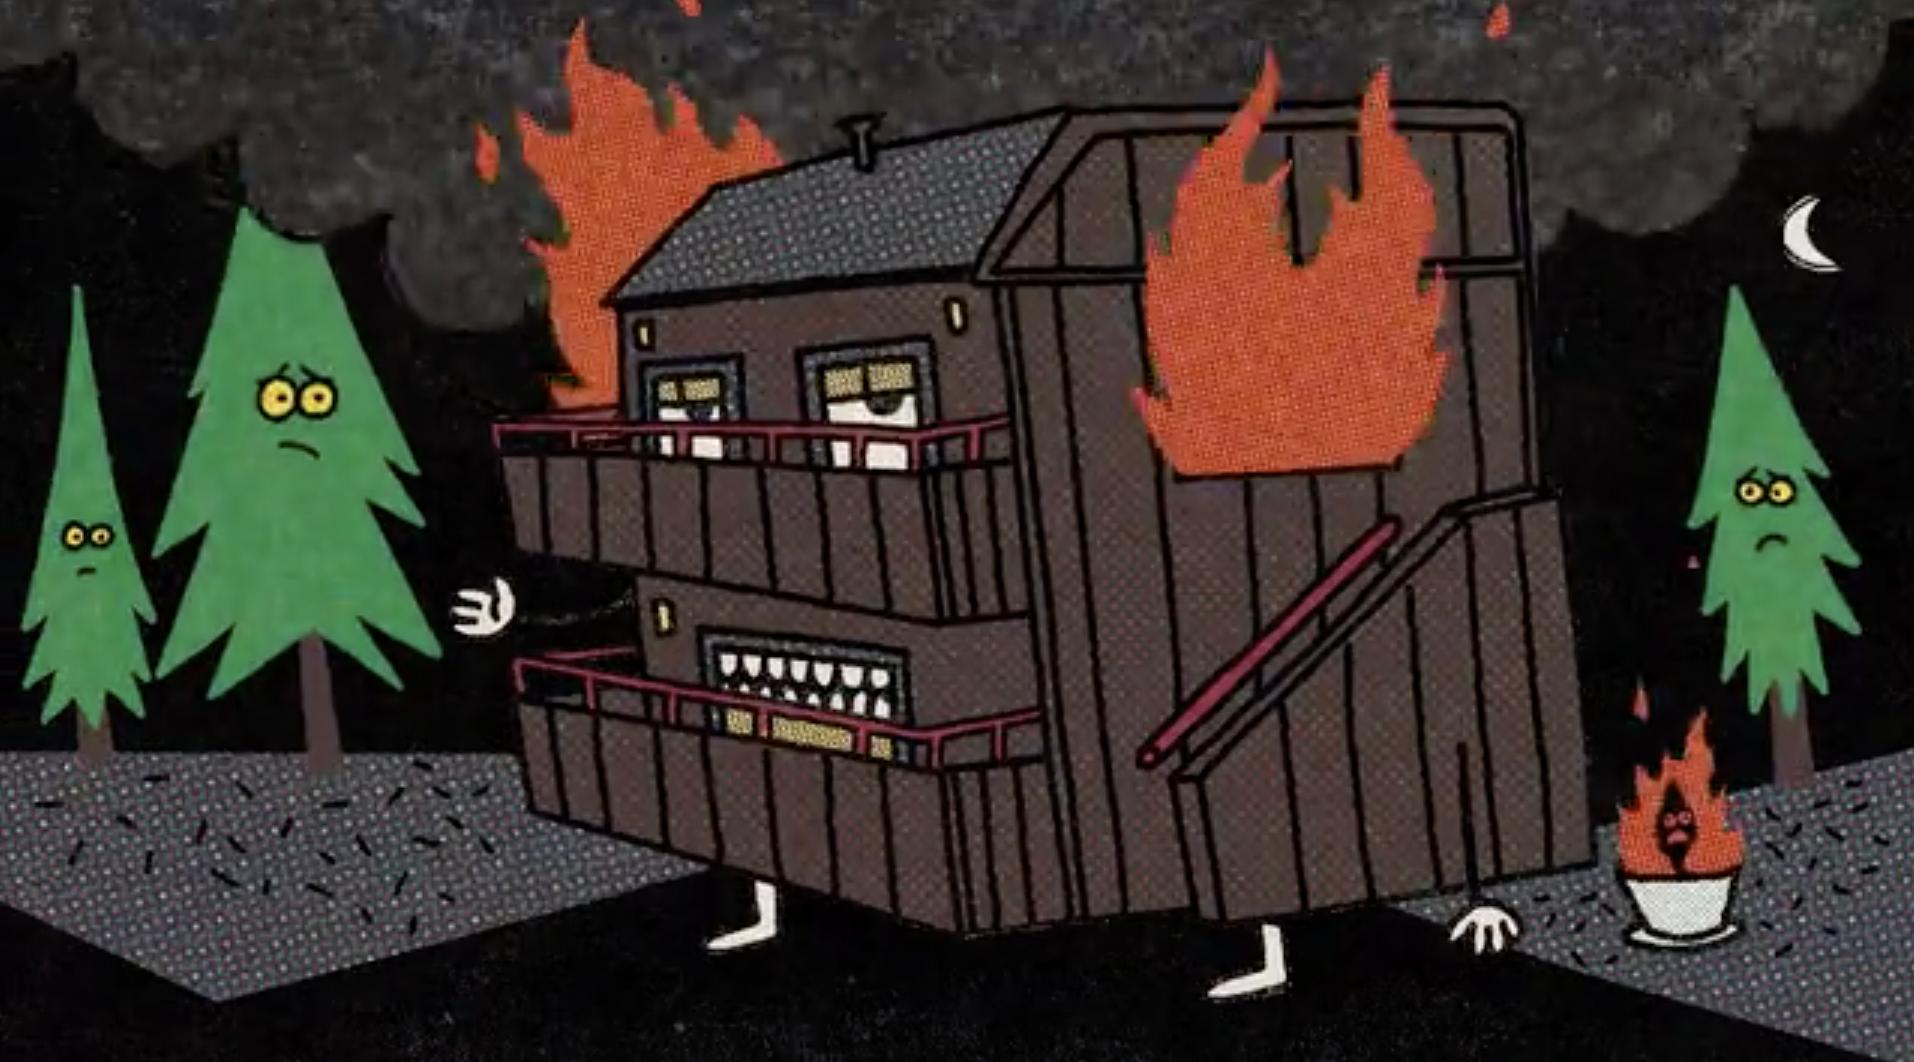 Thumbnail for Improper Cigarette Disposal